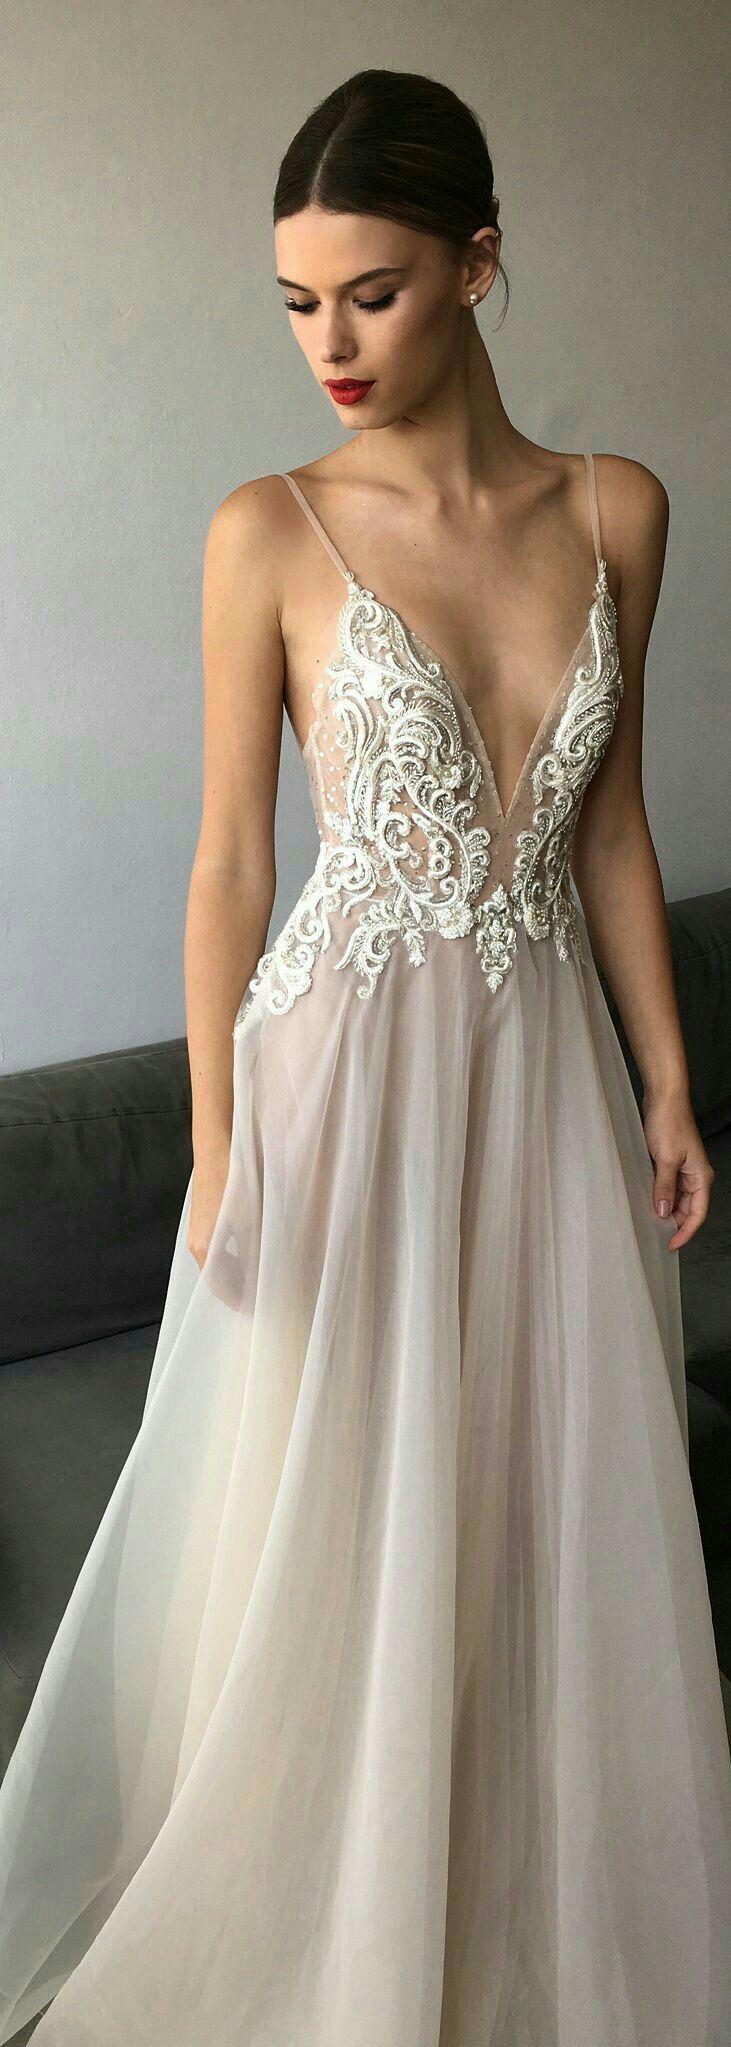 Formatura blair waldorf usaria pinterest google woman and prom